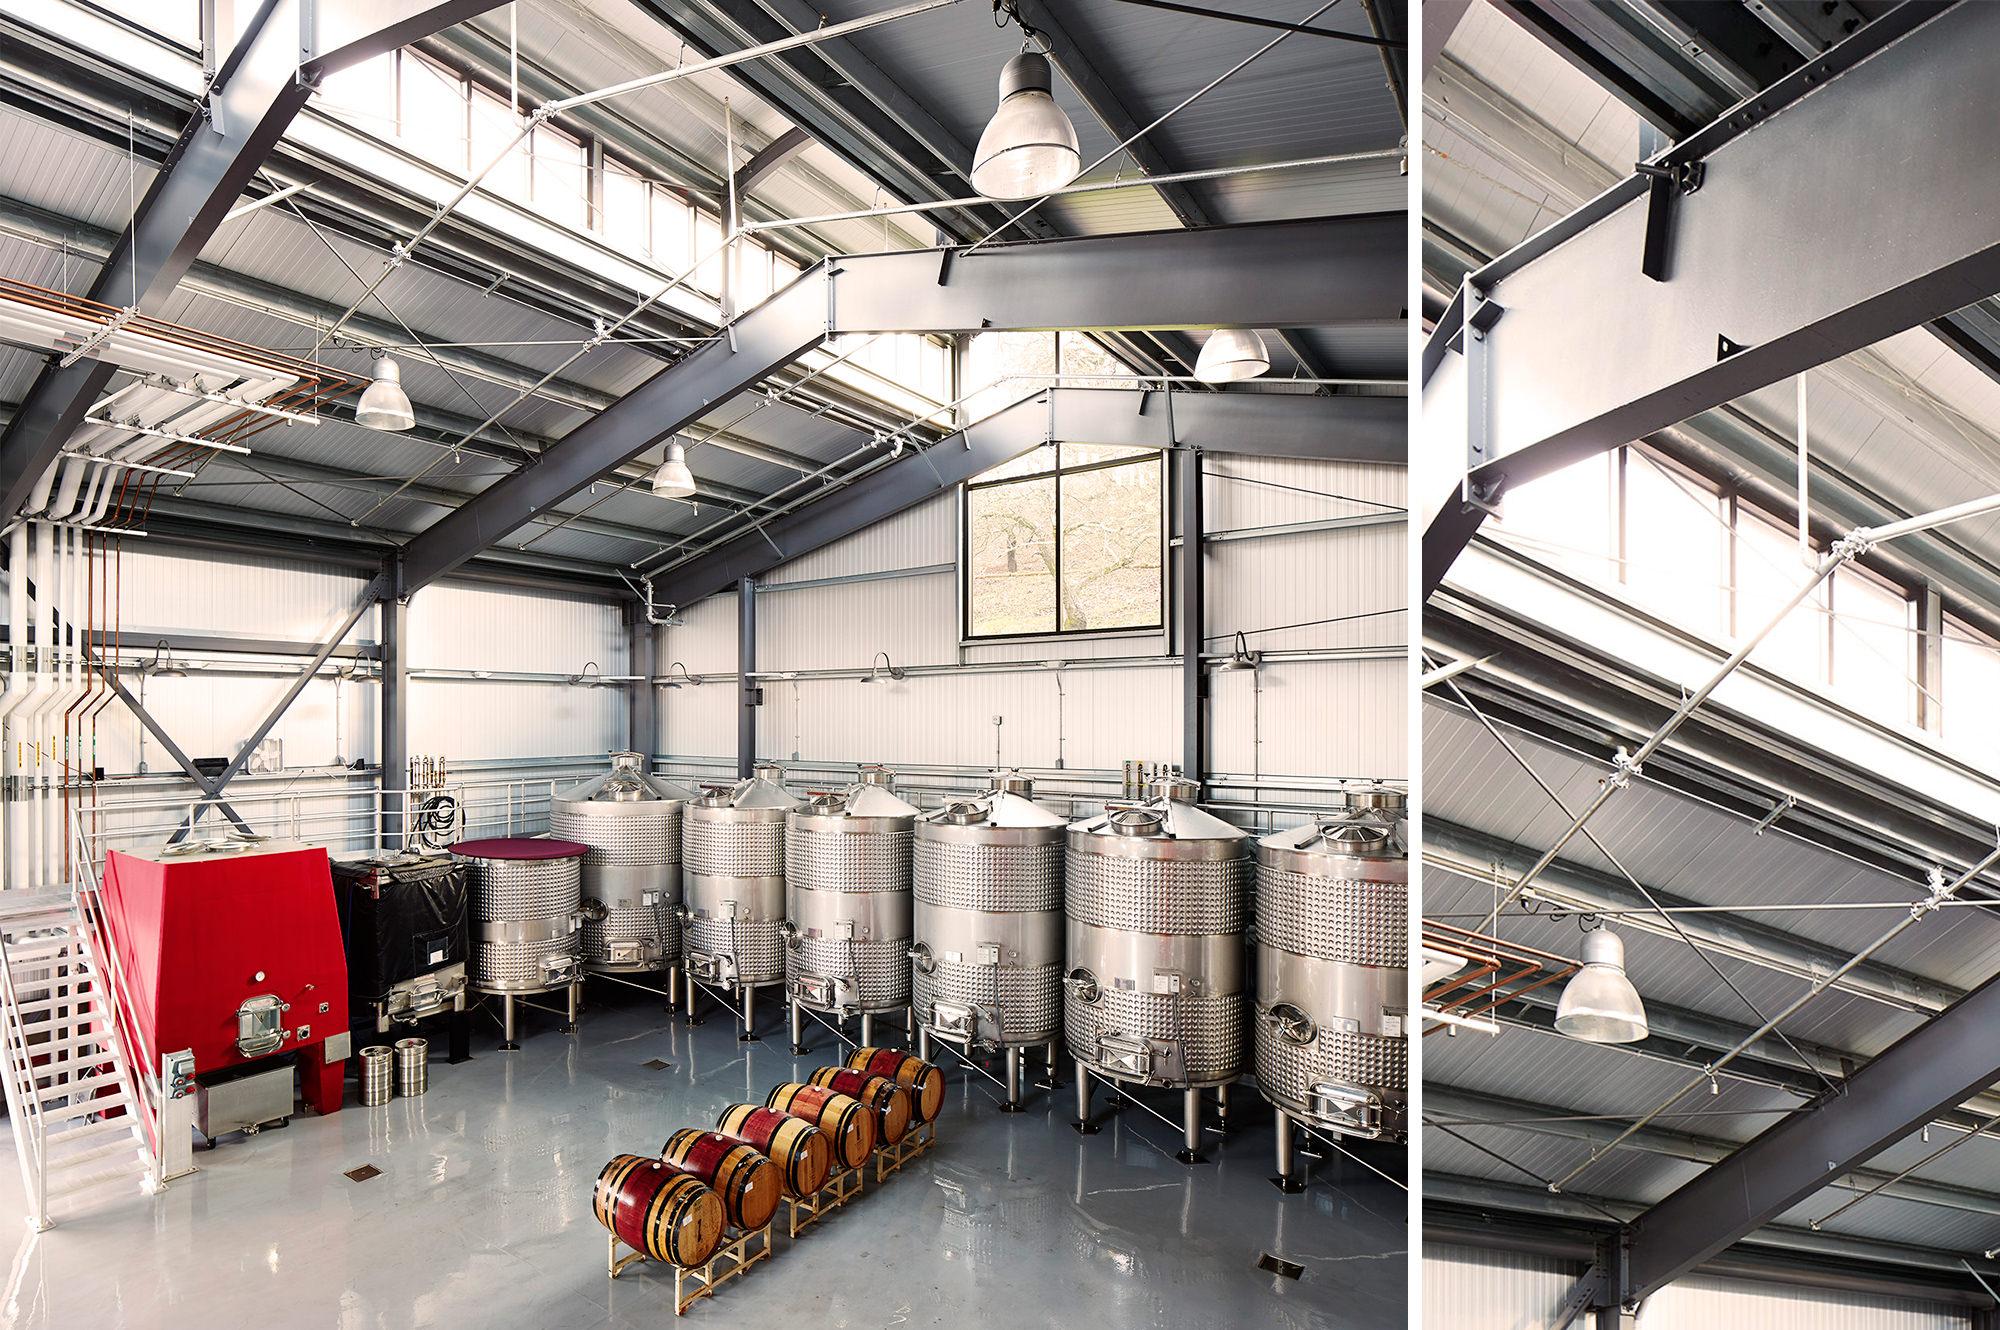 Interior of wine making room at B Cellars Winery